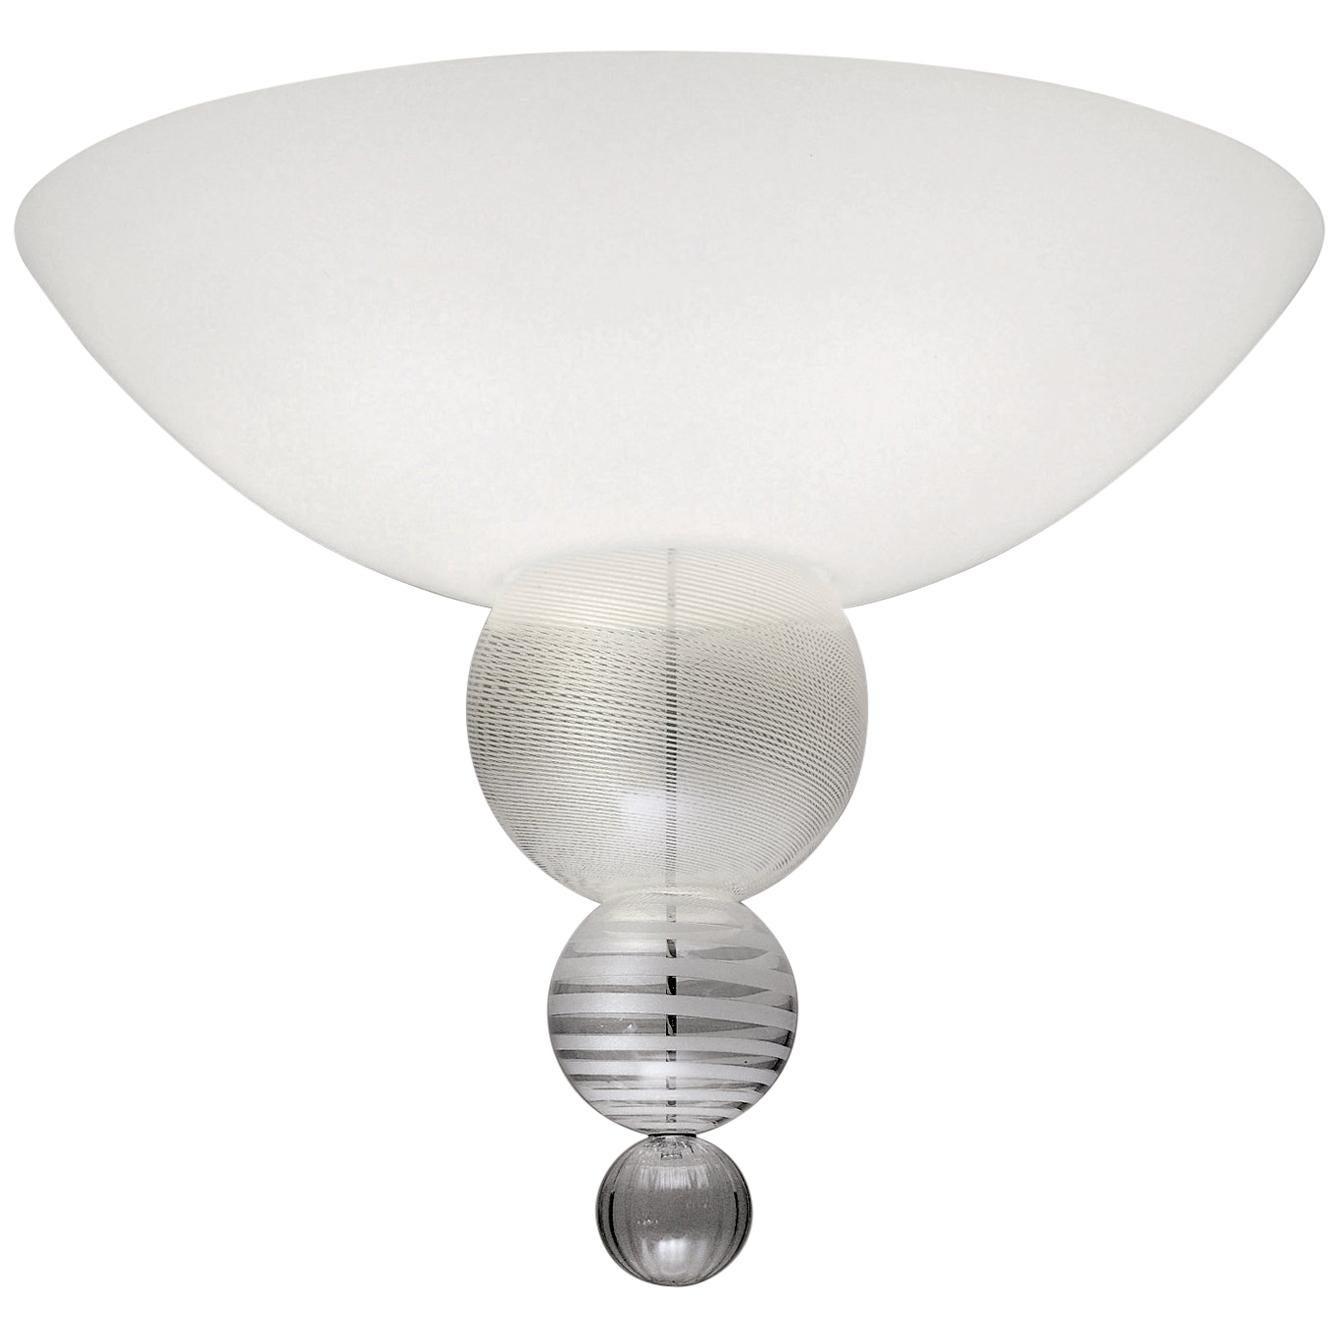 Venini Abaco Flush Light in White by Monica Guggisberg & Philip Baldwin